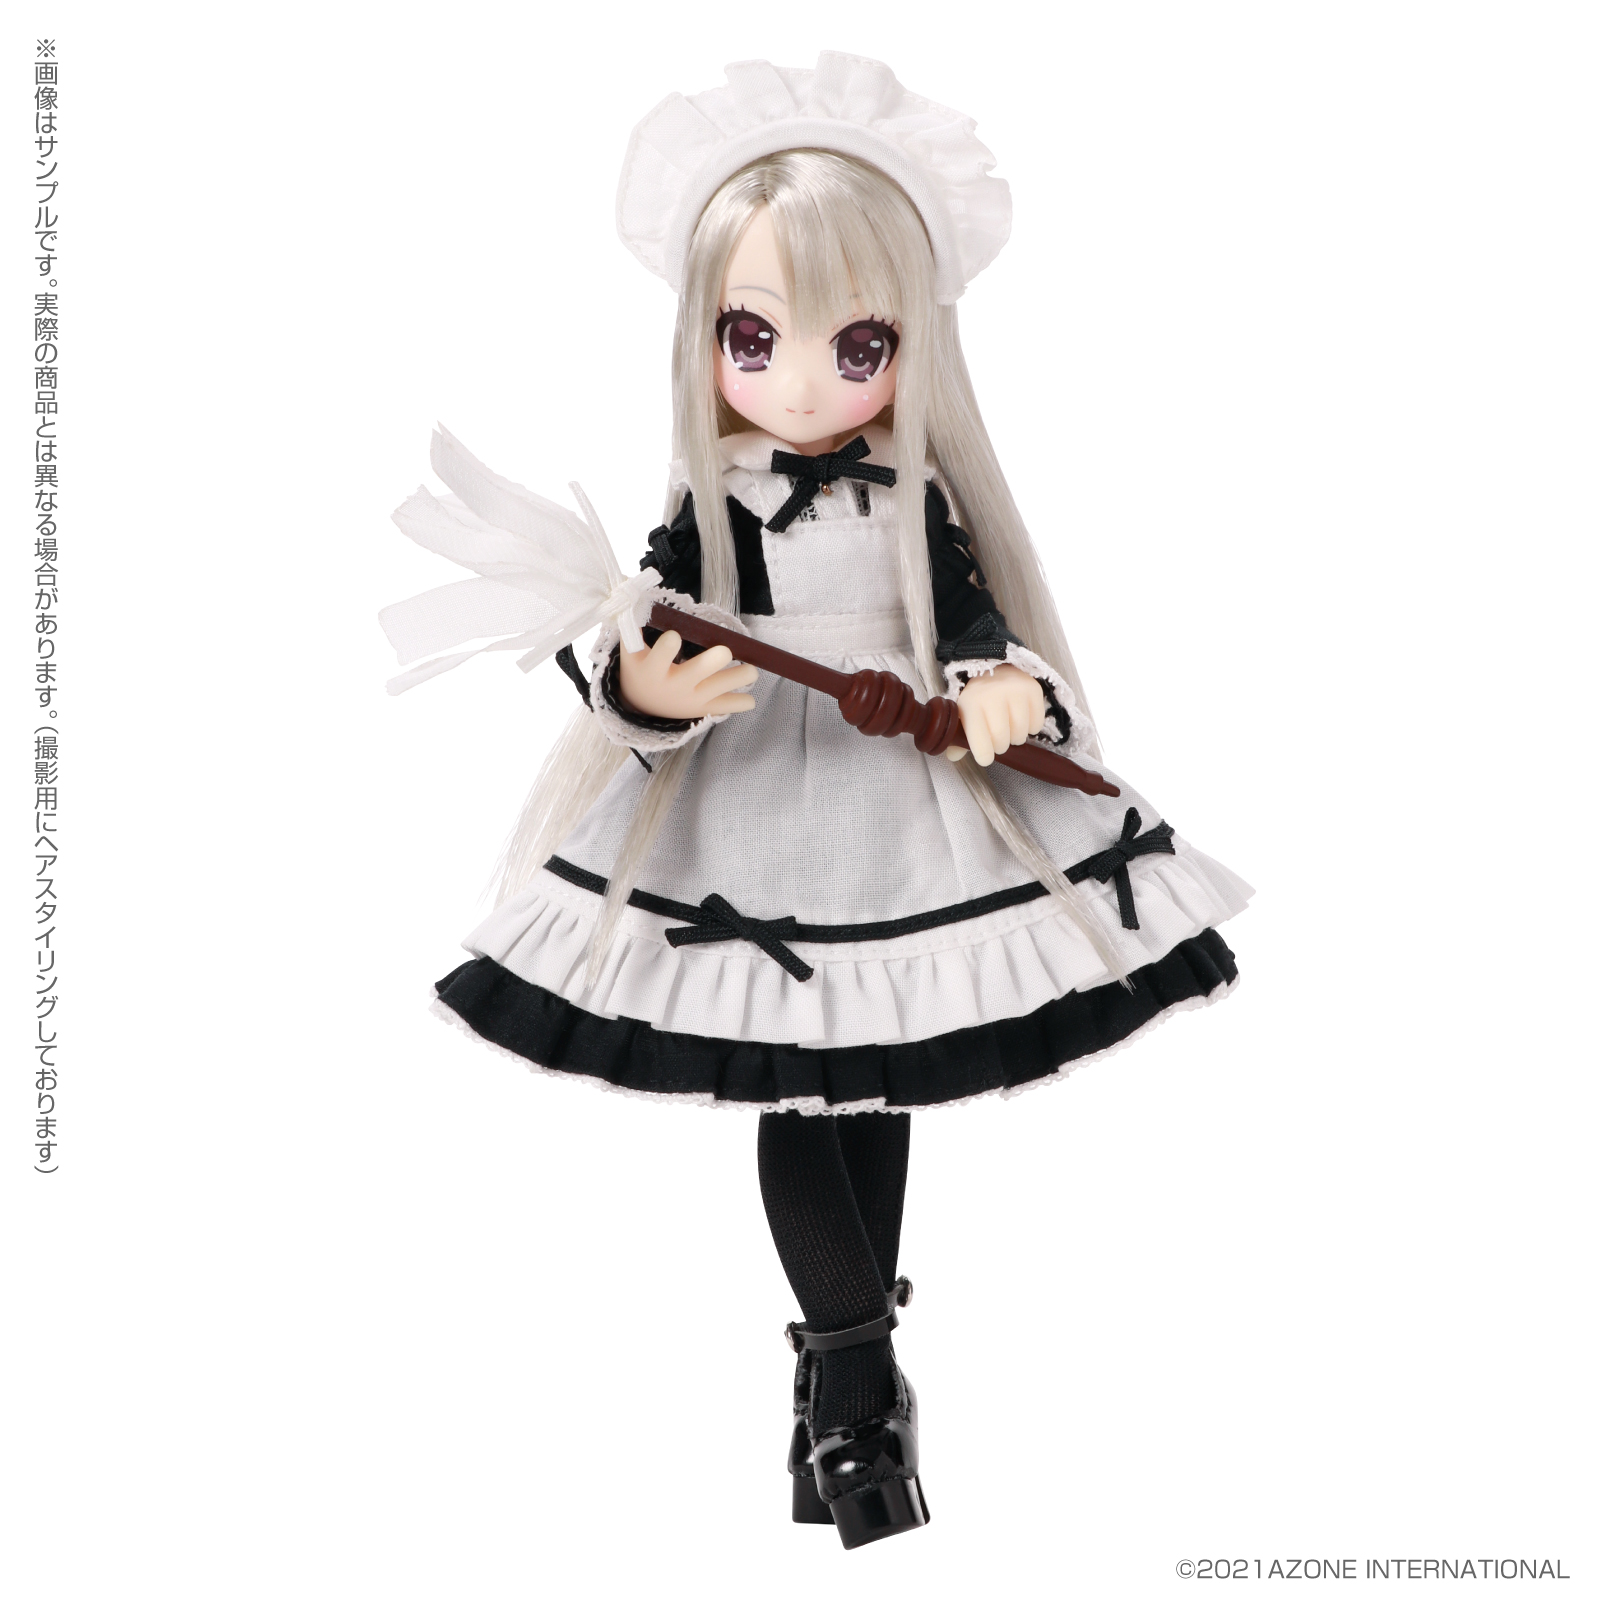 Lil'Fairy ~ちいさなお手伝いさん~『ヴェル 7th anniv.(ノーマル口ver.)』1/12 完成品ドール-006